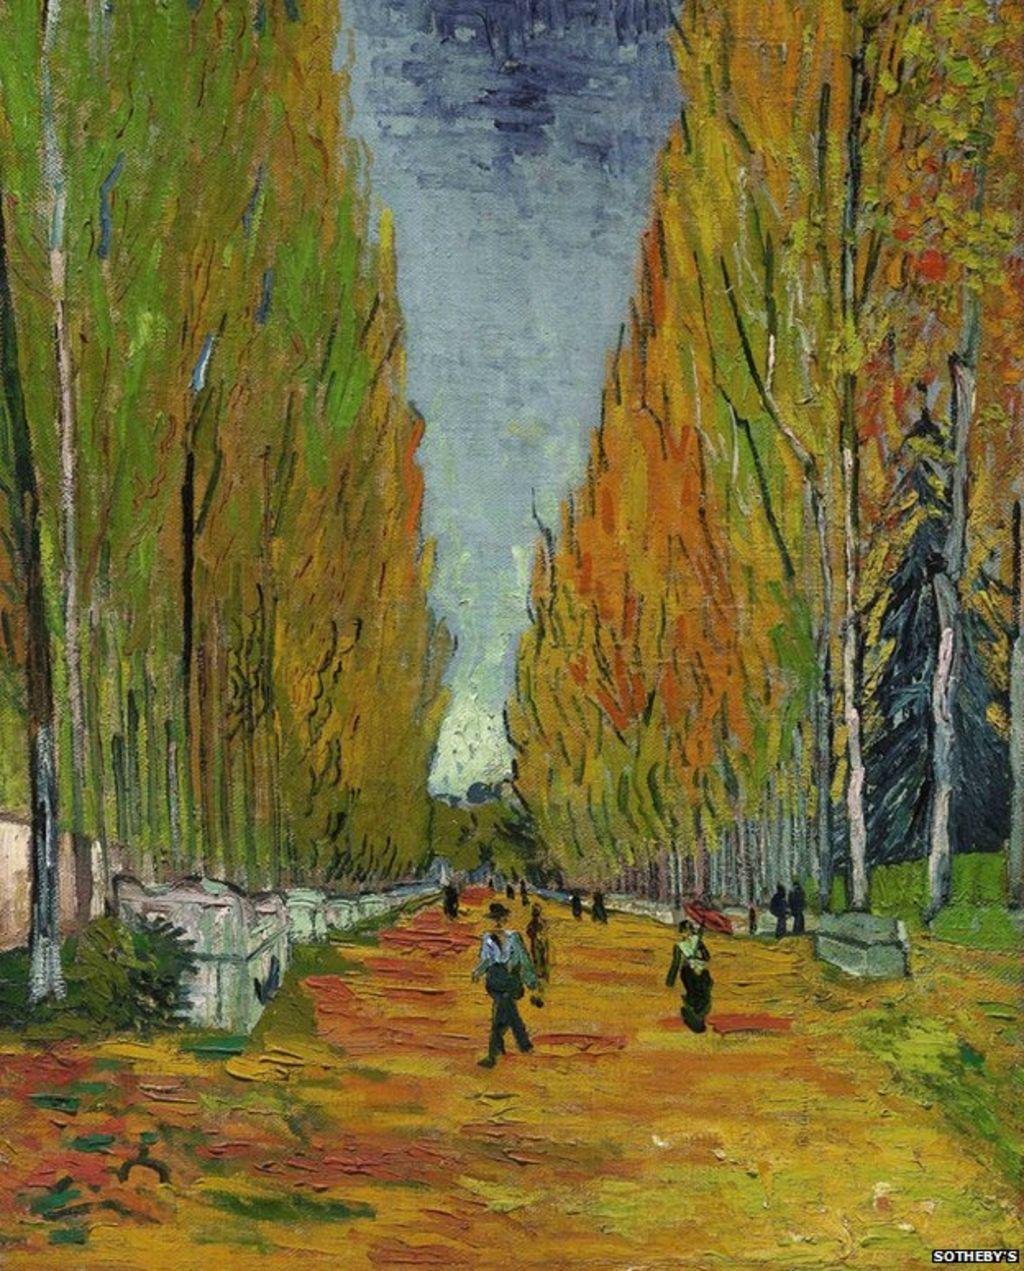 Vincent van Gogh, L'Allée des Alyscamps, 1888, image via BBC